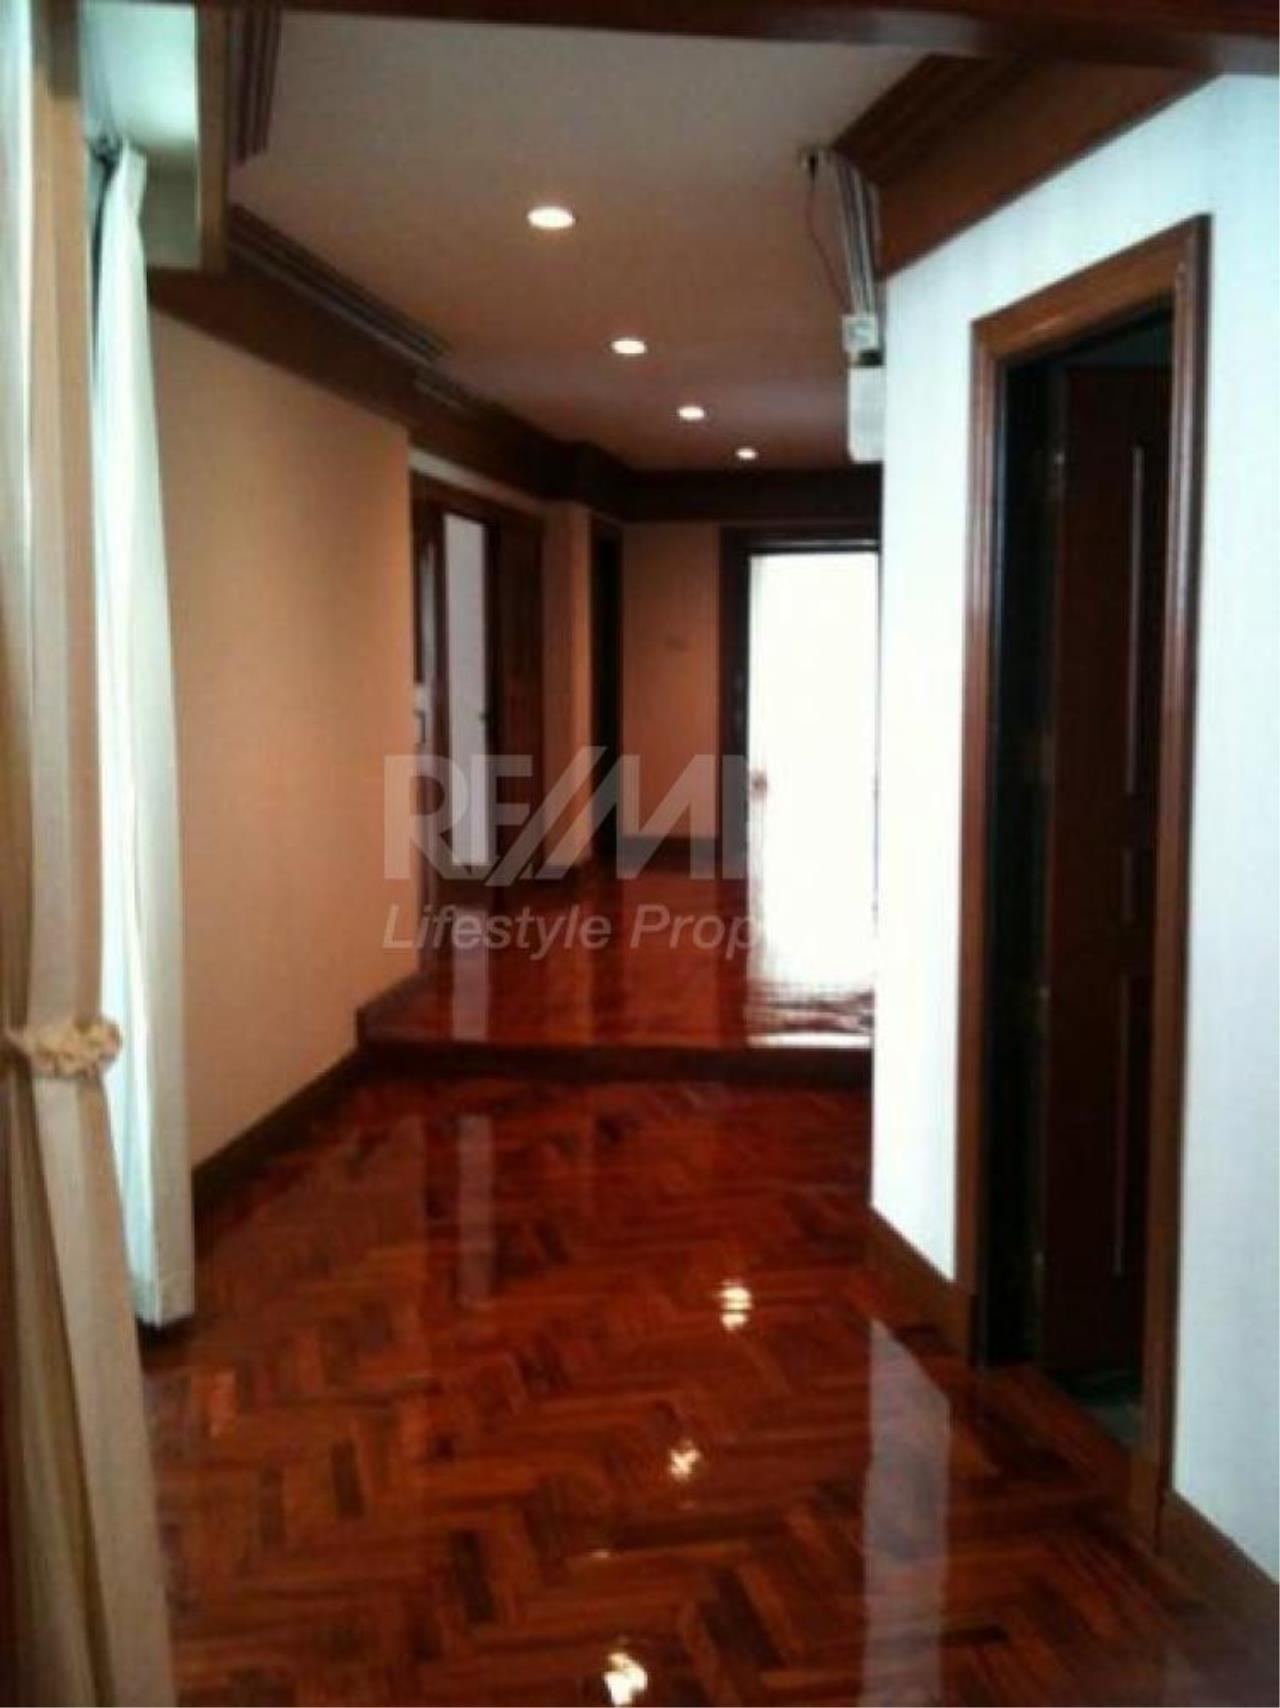 RE/MAX LifeStyle Property Agency's Raj Mansion 2